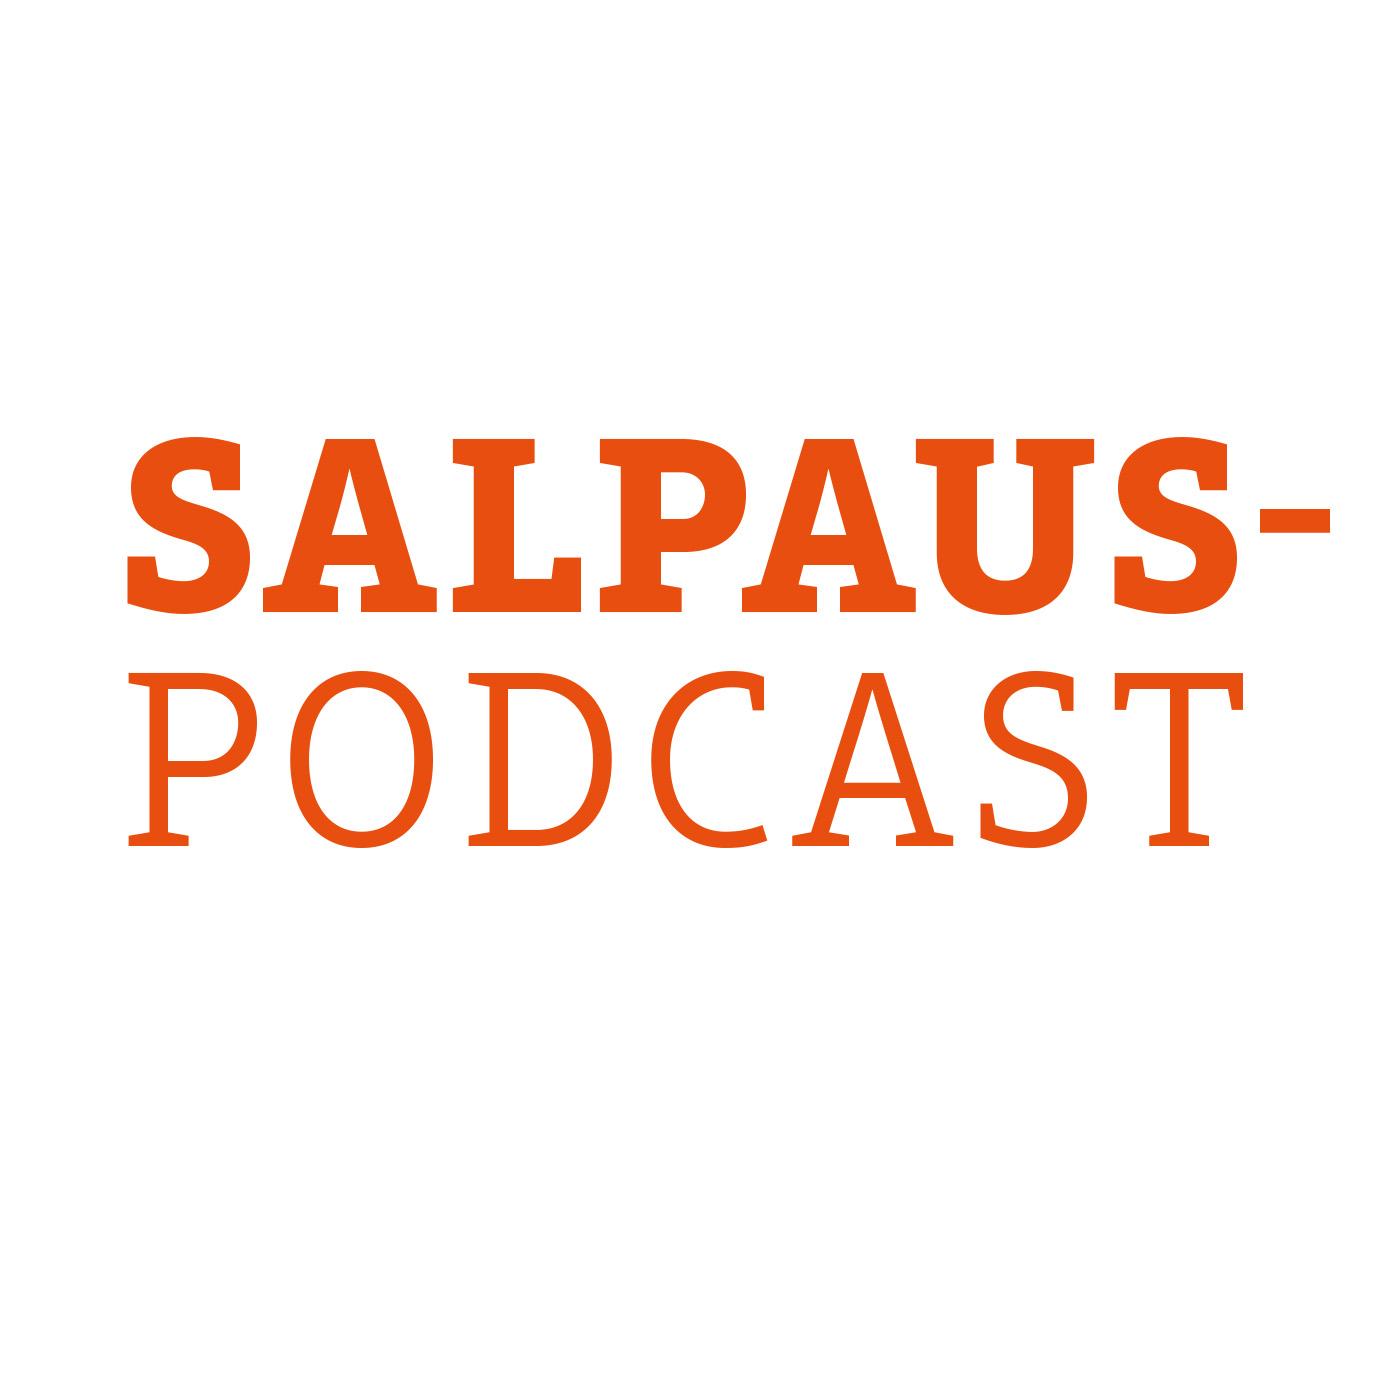 Salpaus Podcast